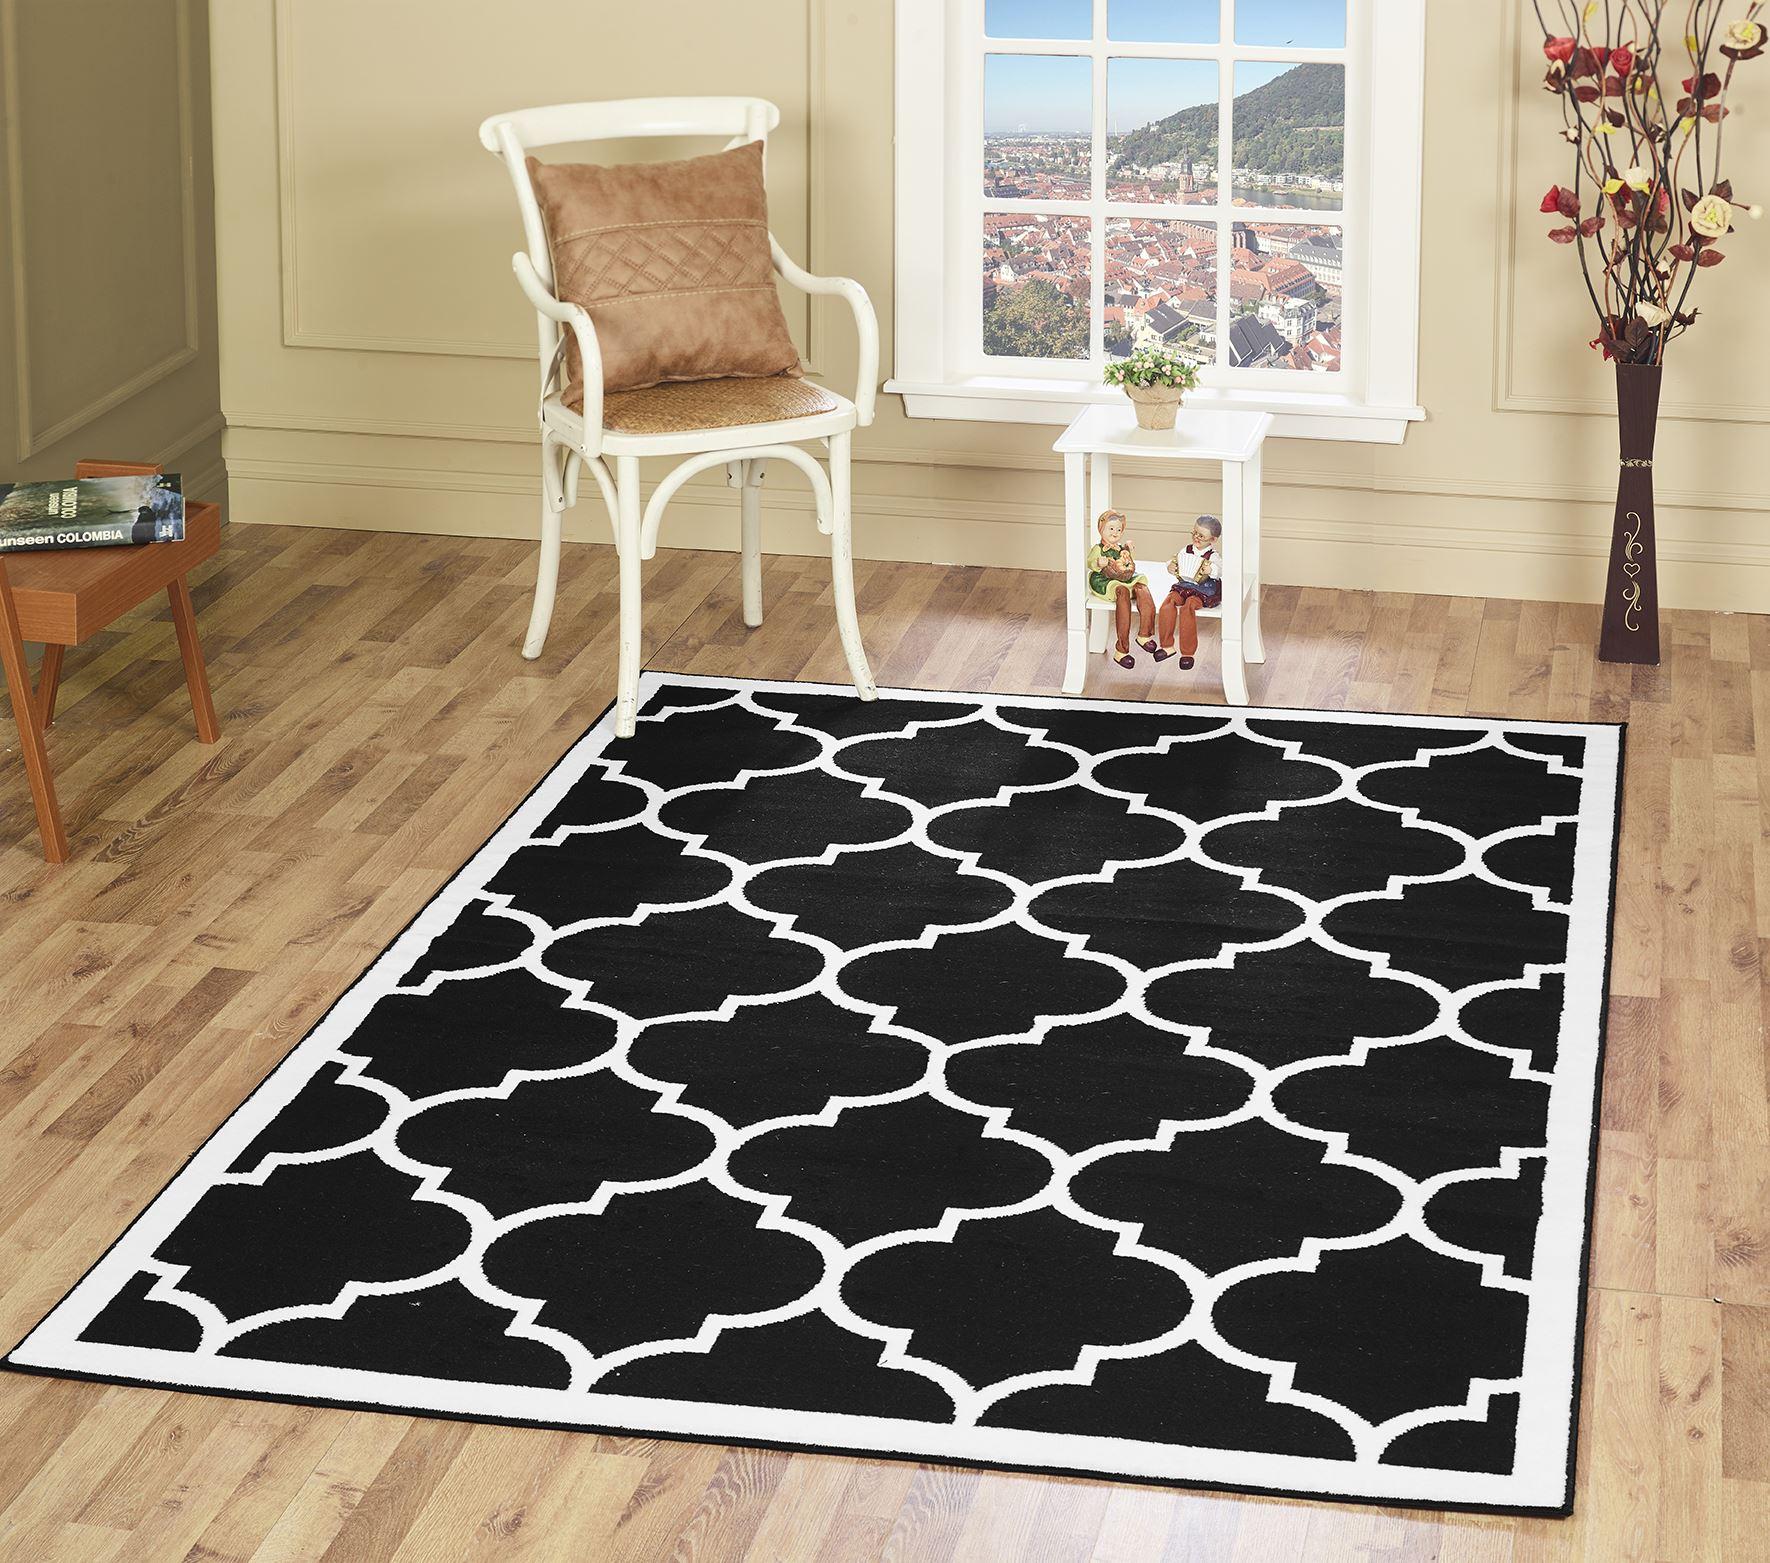 Large-Modern-Classic-Trellis-INDOOR-RUGS-Coloured-Floor-Carpet-Outdoor-Rug-Mats thumbnail 14